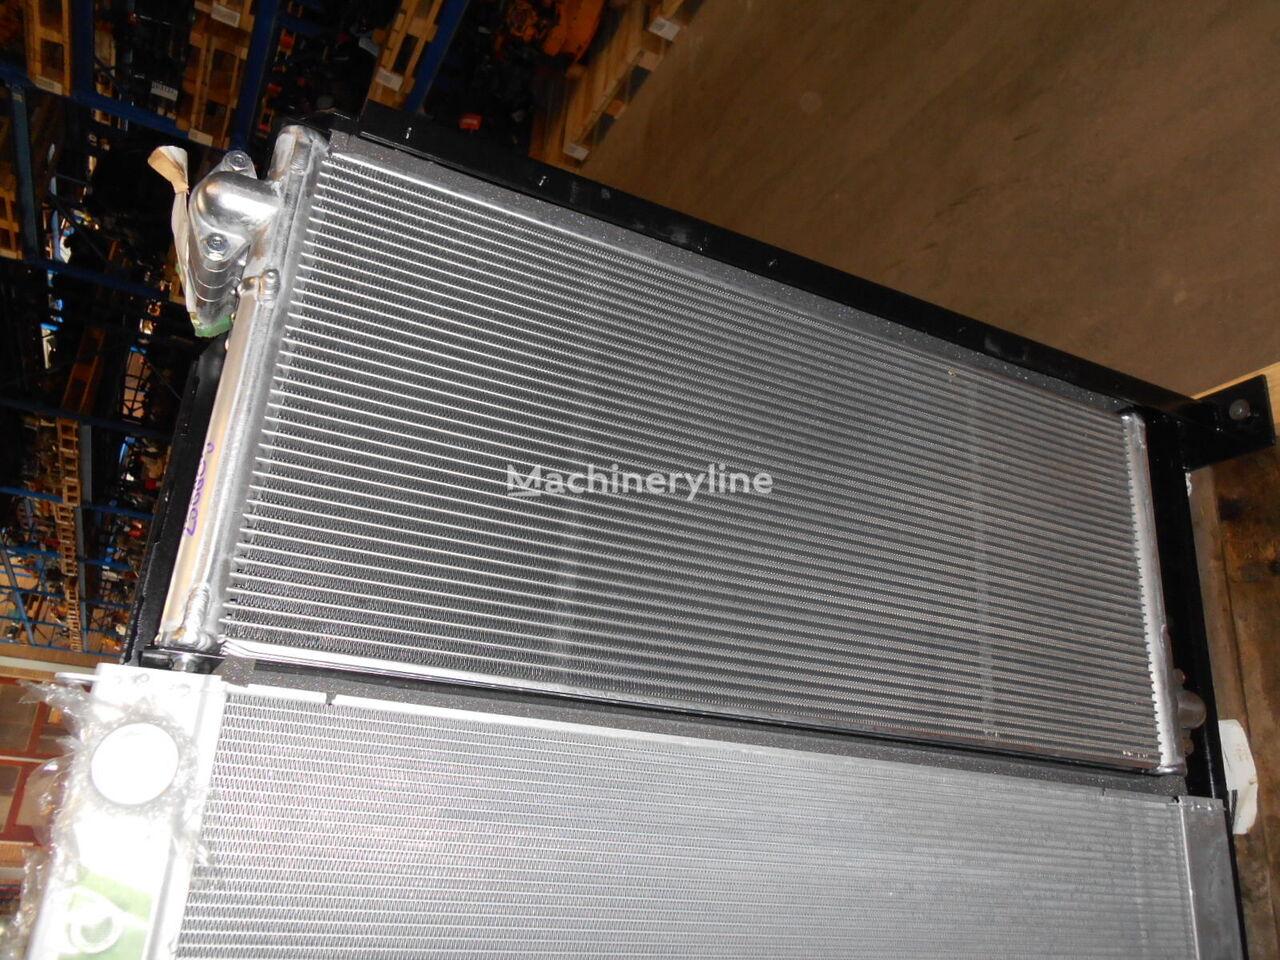 KOBELCO T.Rad 1452-112-8050 engine cooling radiator for KOBELCO SK350 excavator